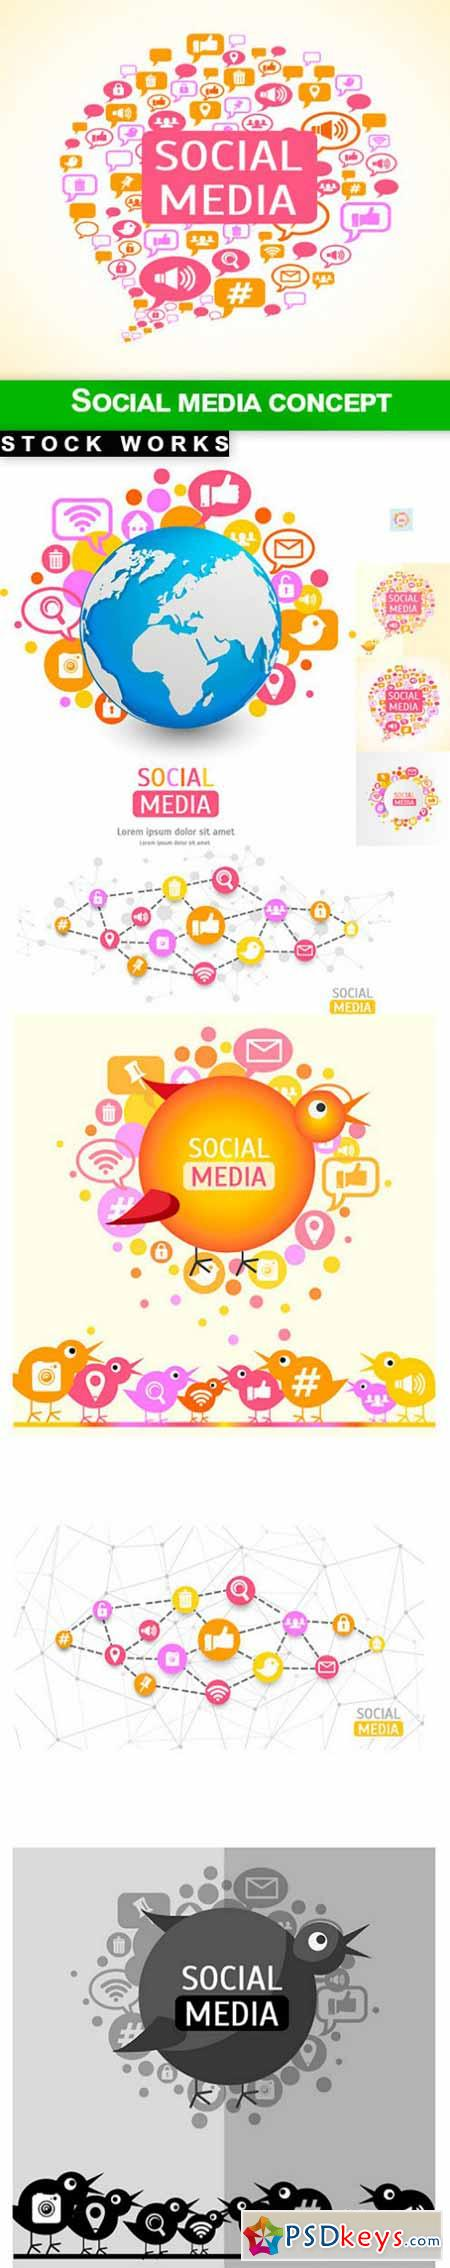 Social media concept - 9 EPS